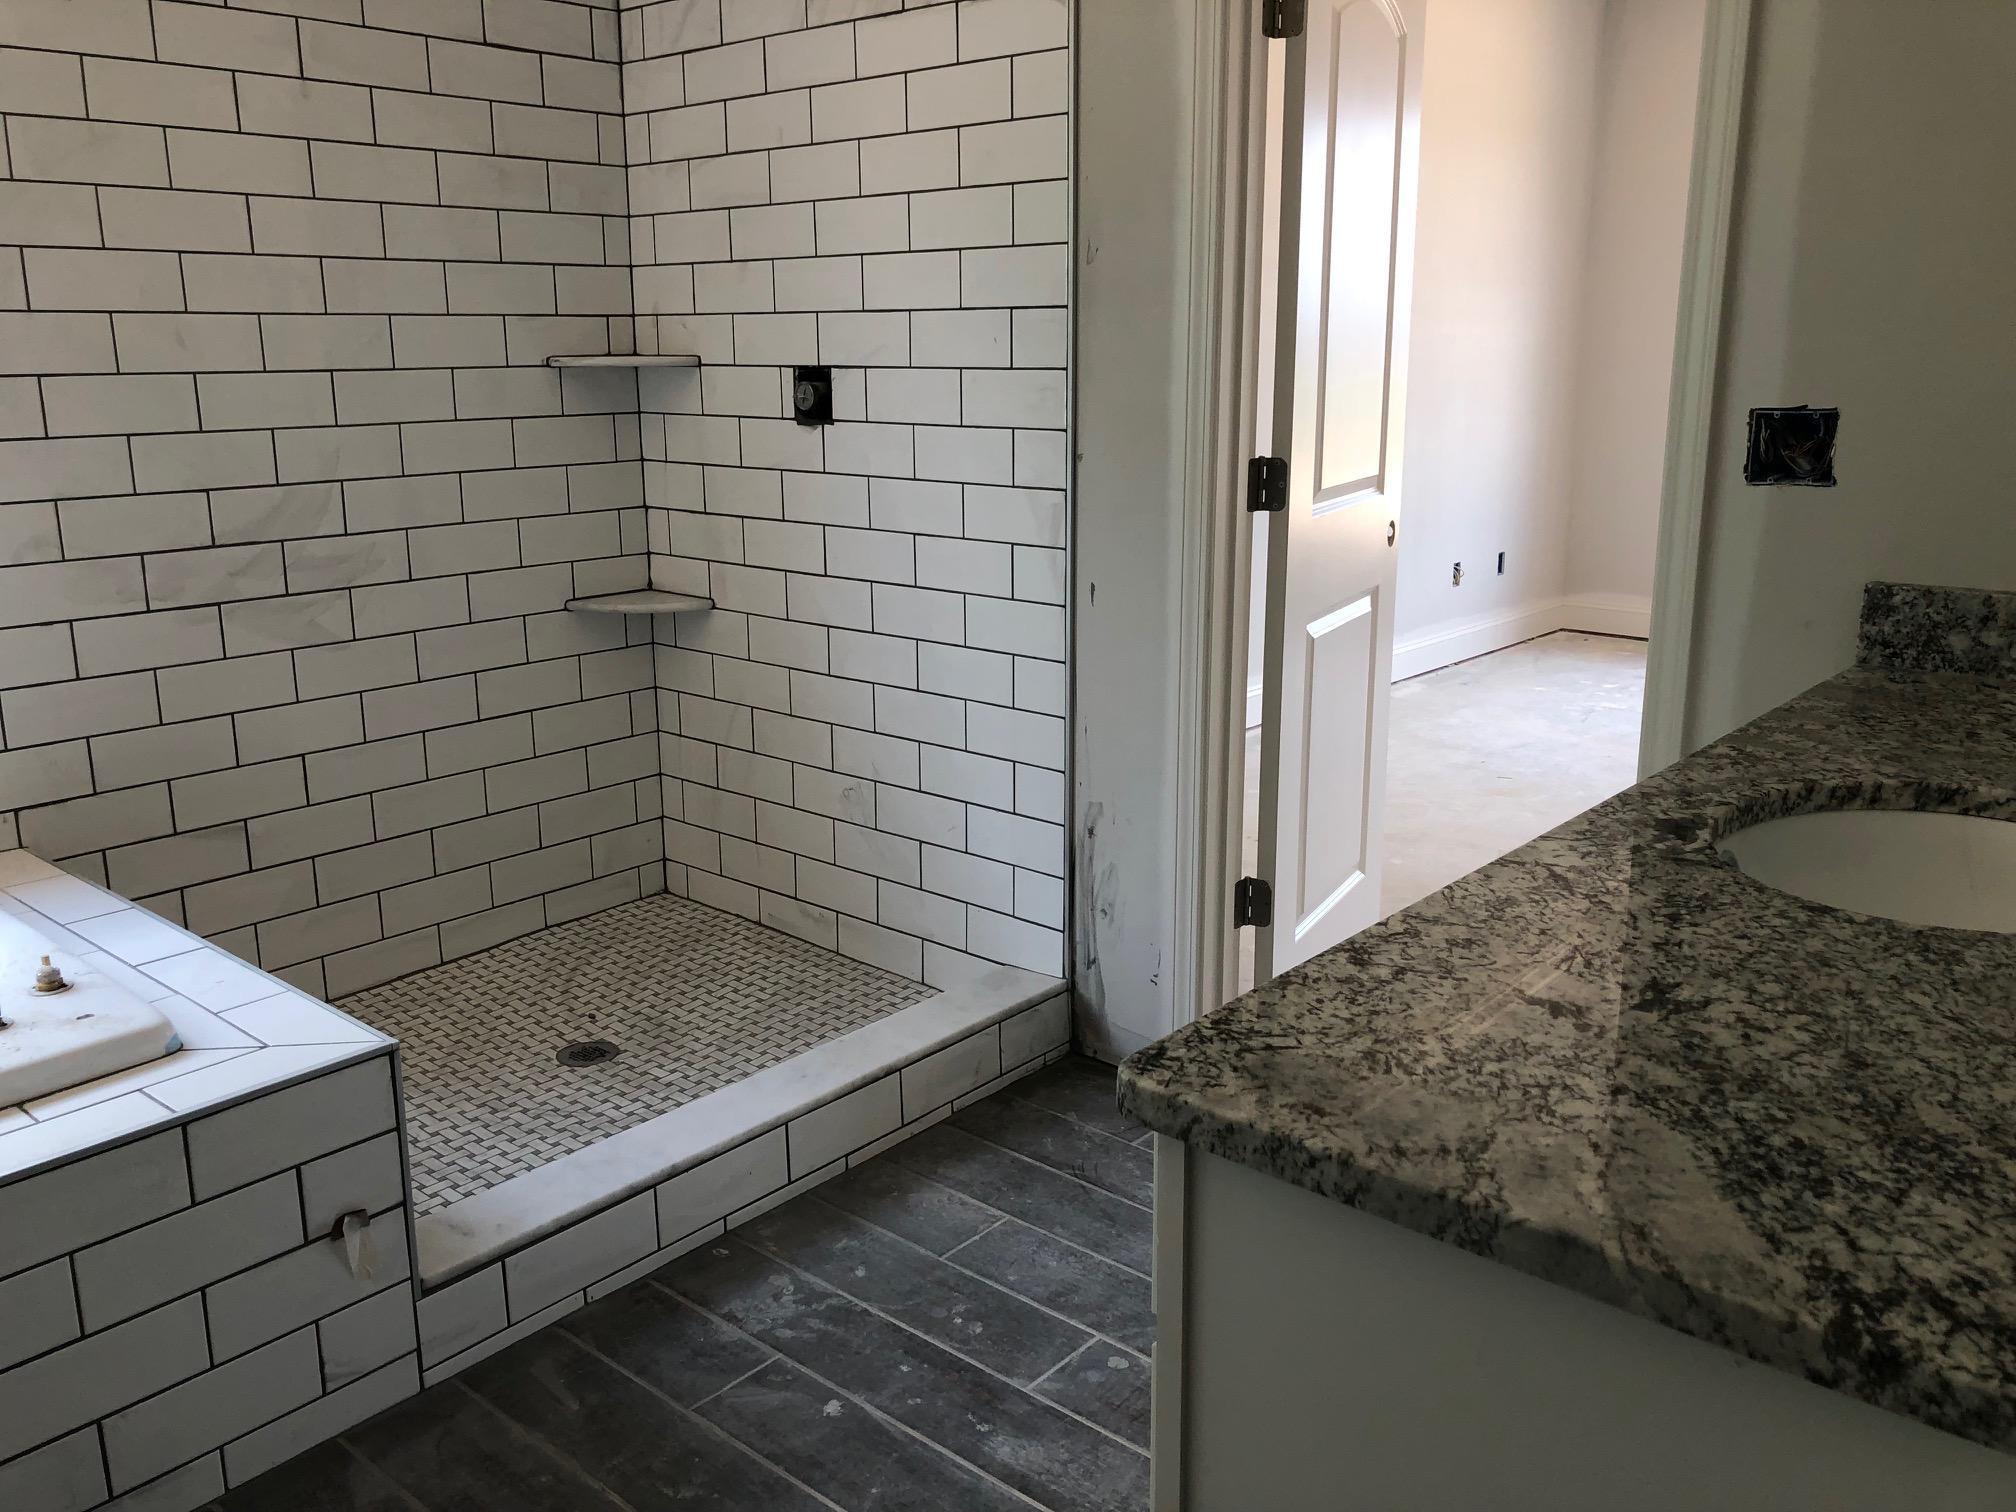 Separate tiled shower